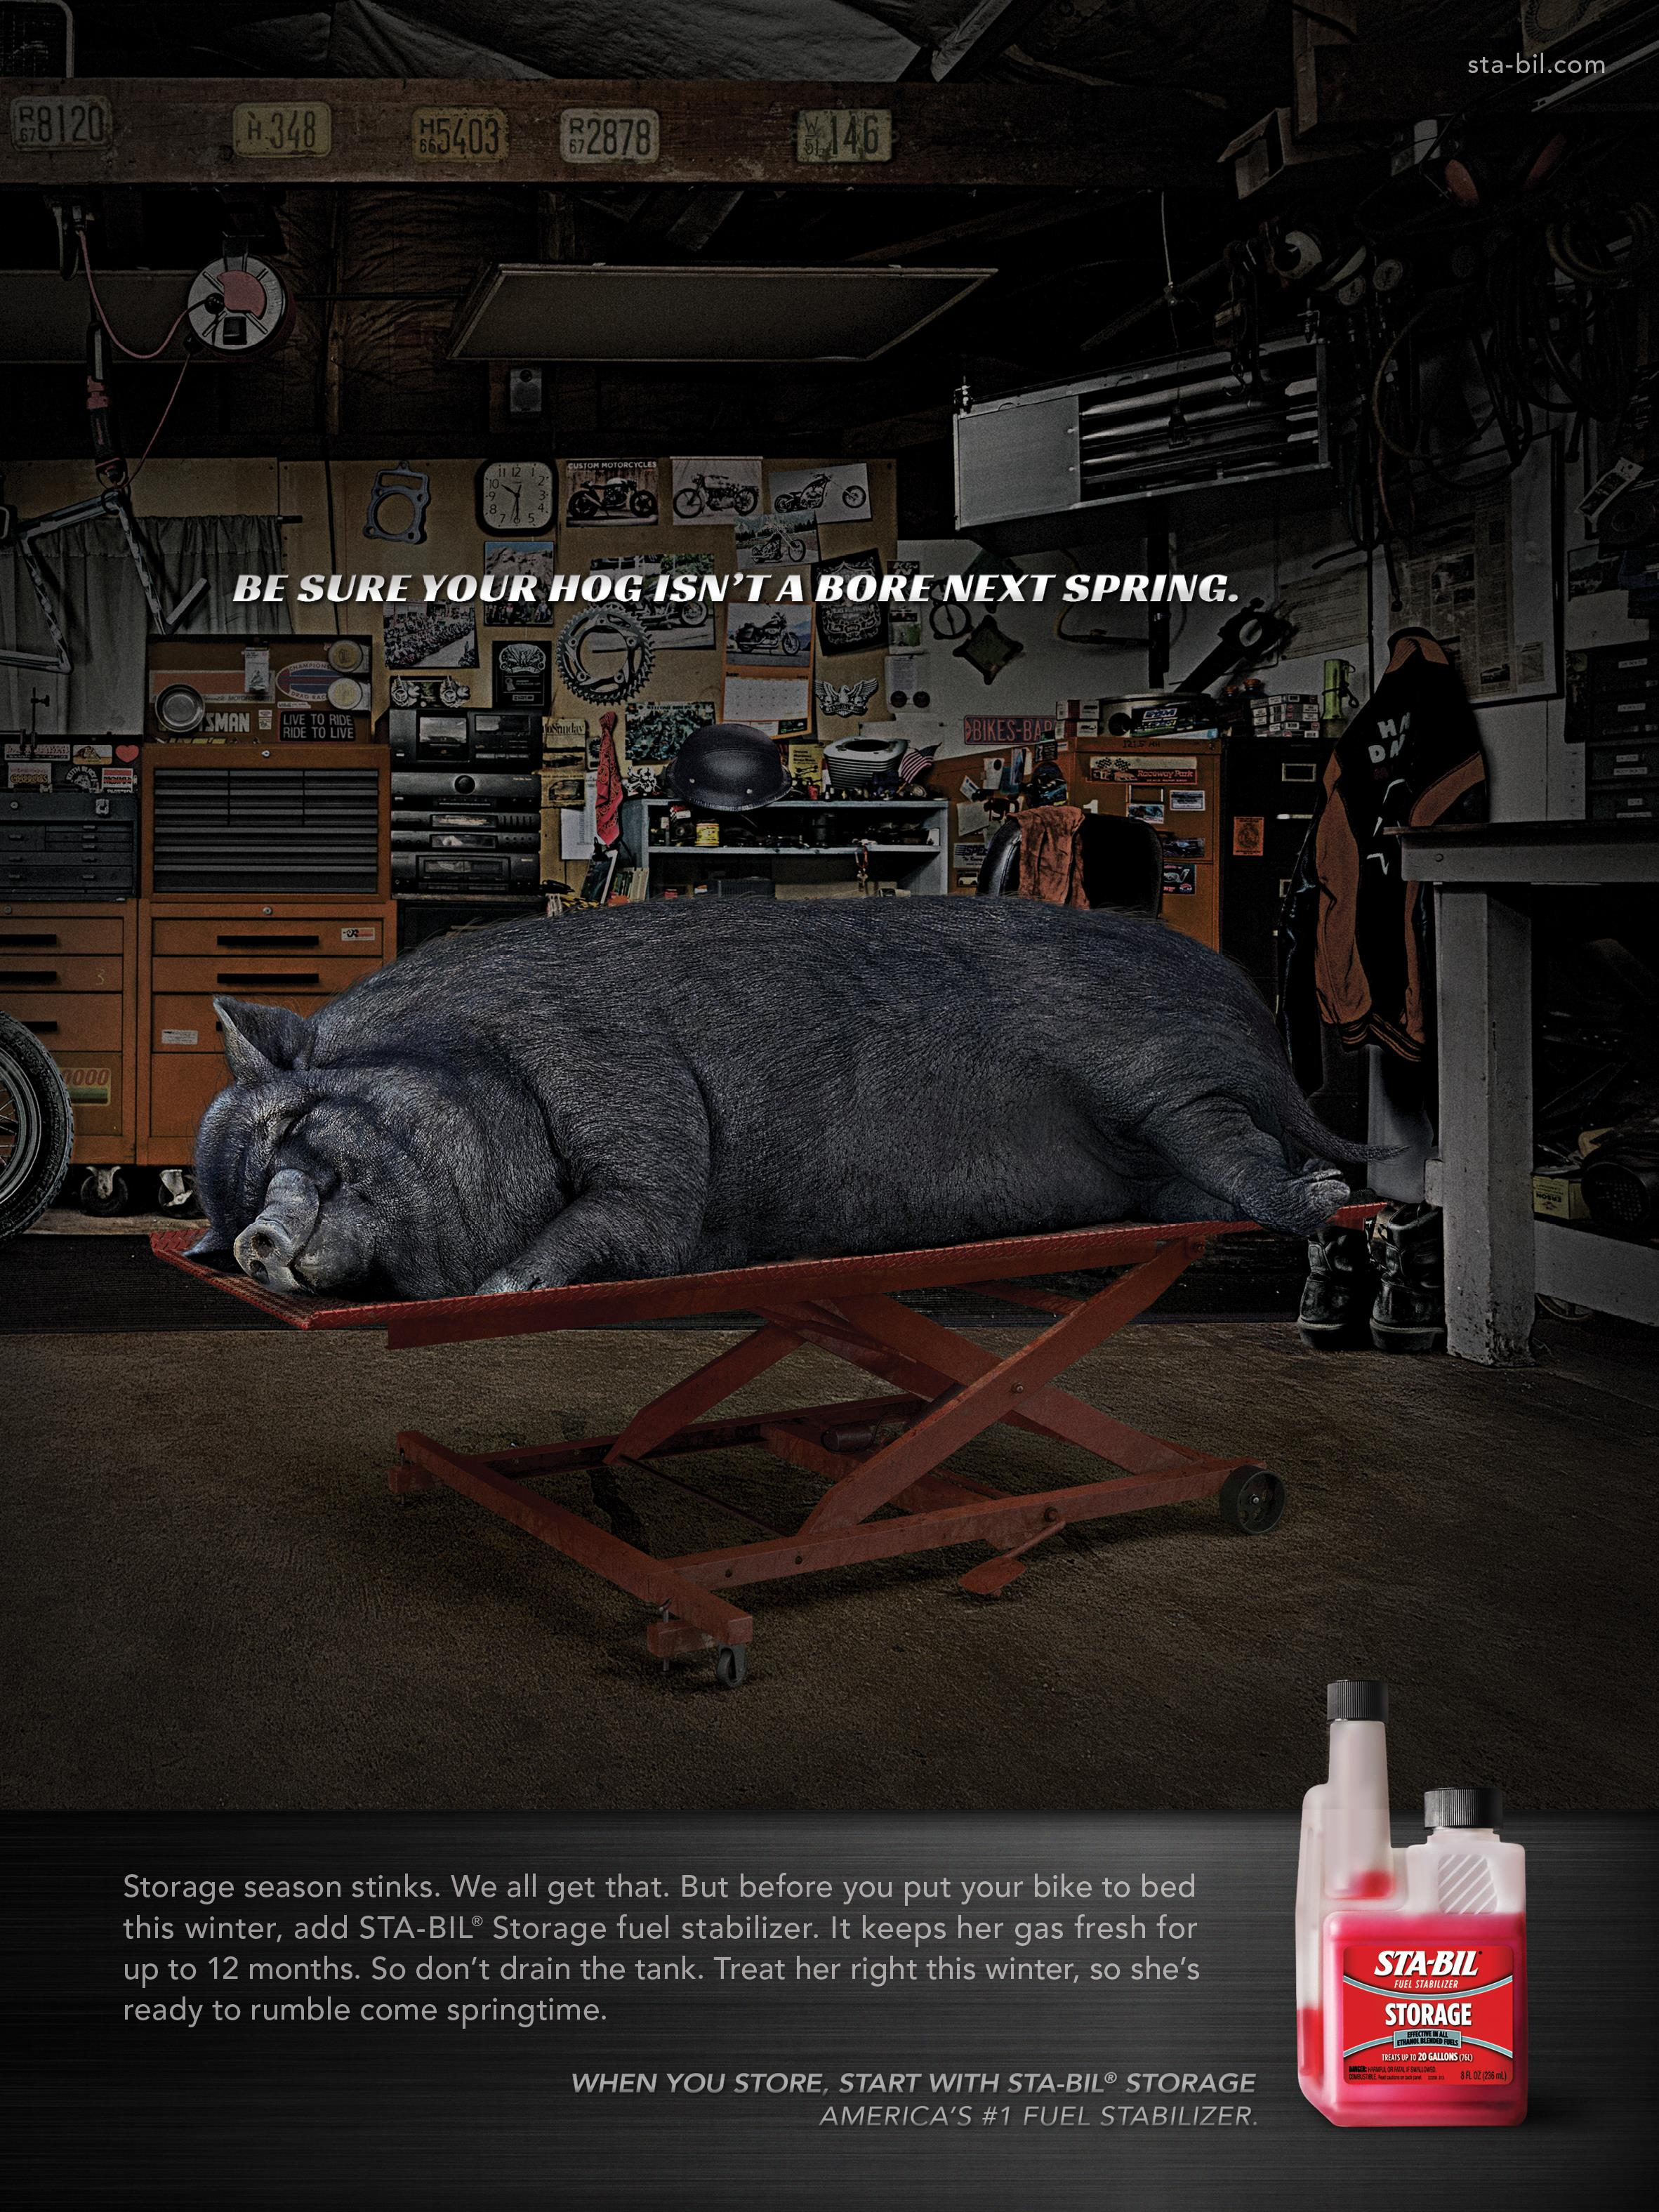 STA-BIL: Hibernation/Hog